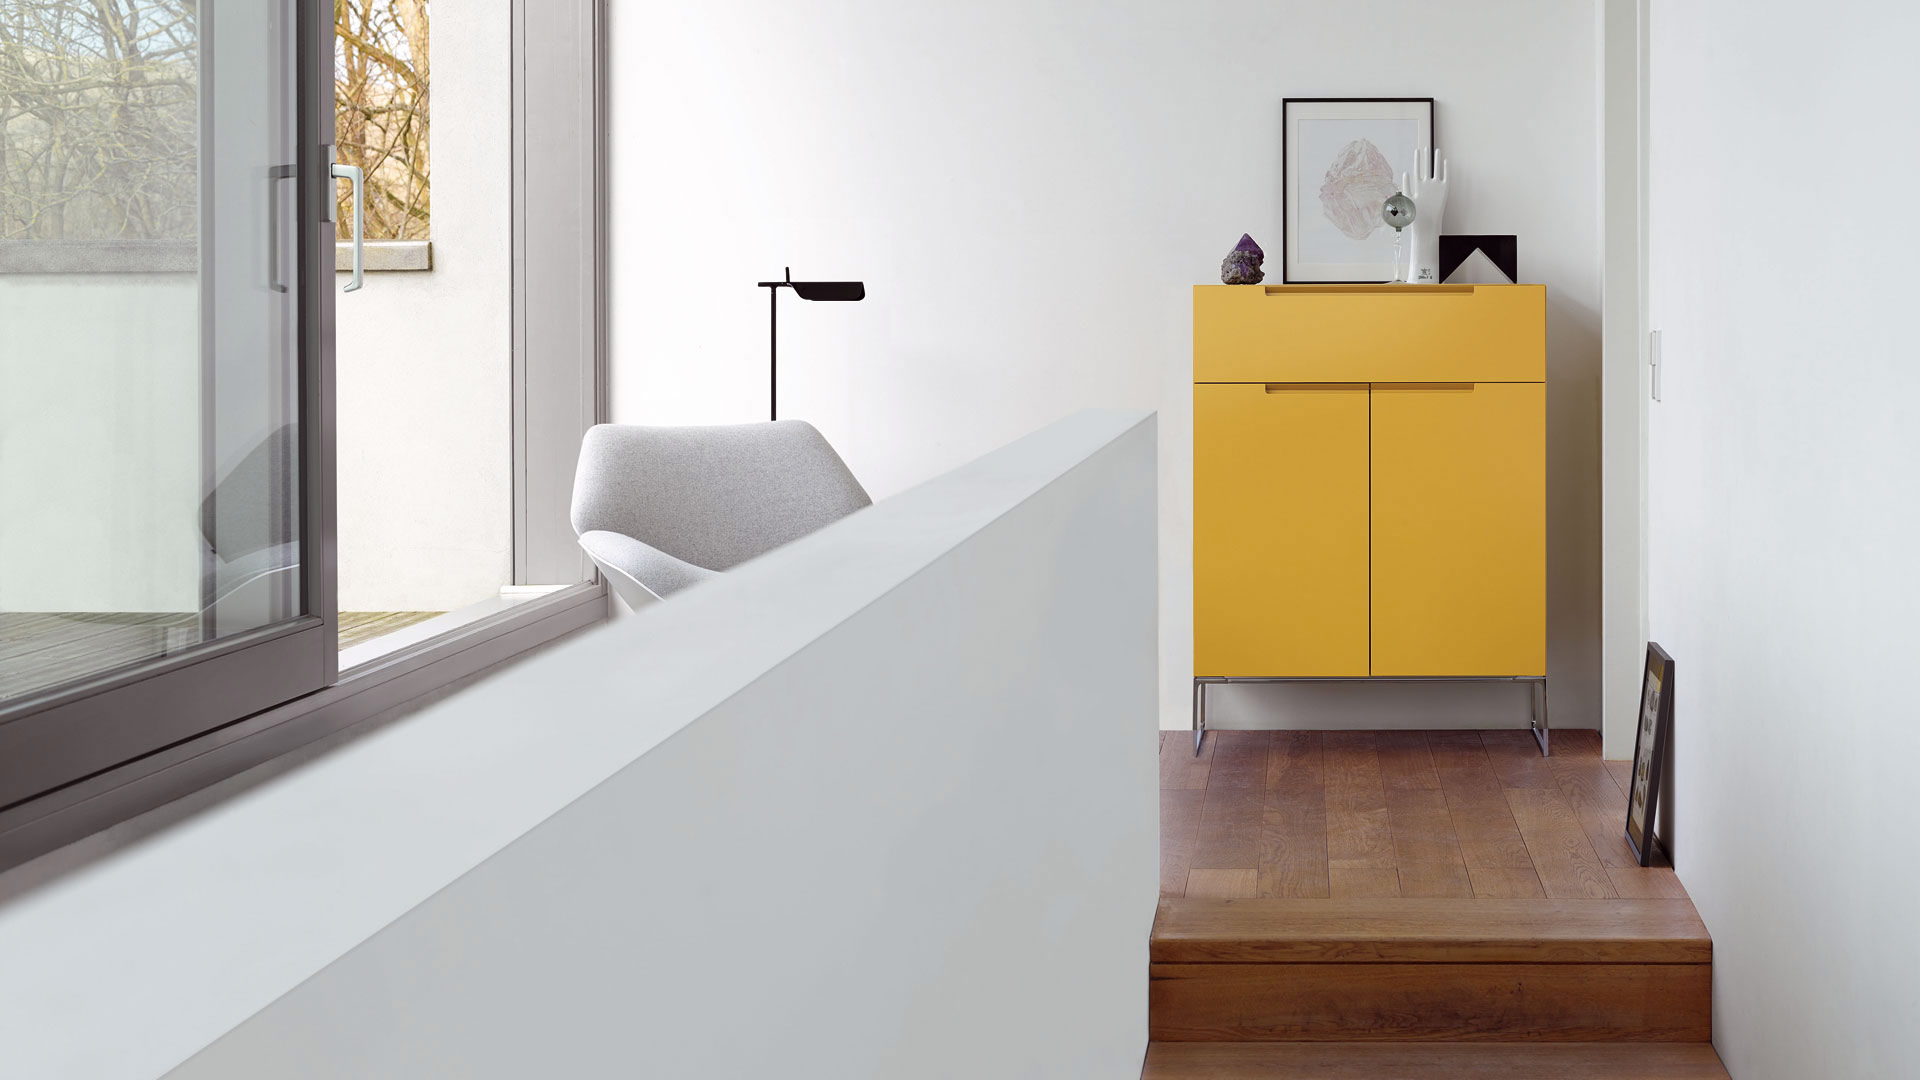 Mell interl bke wohn design blau for Wohn design